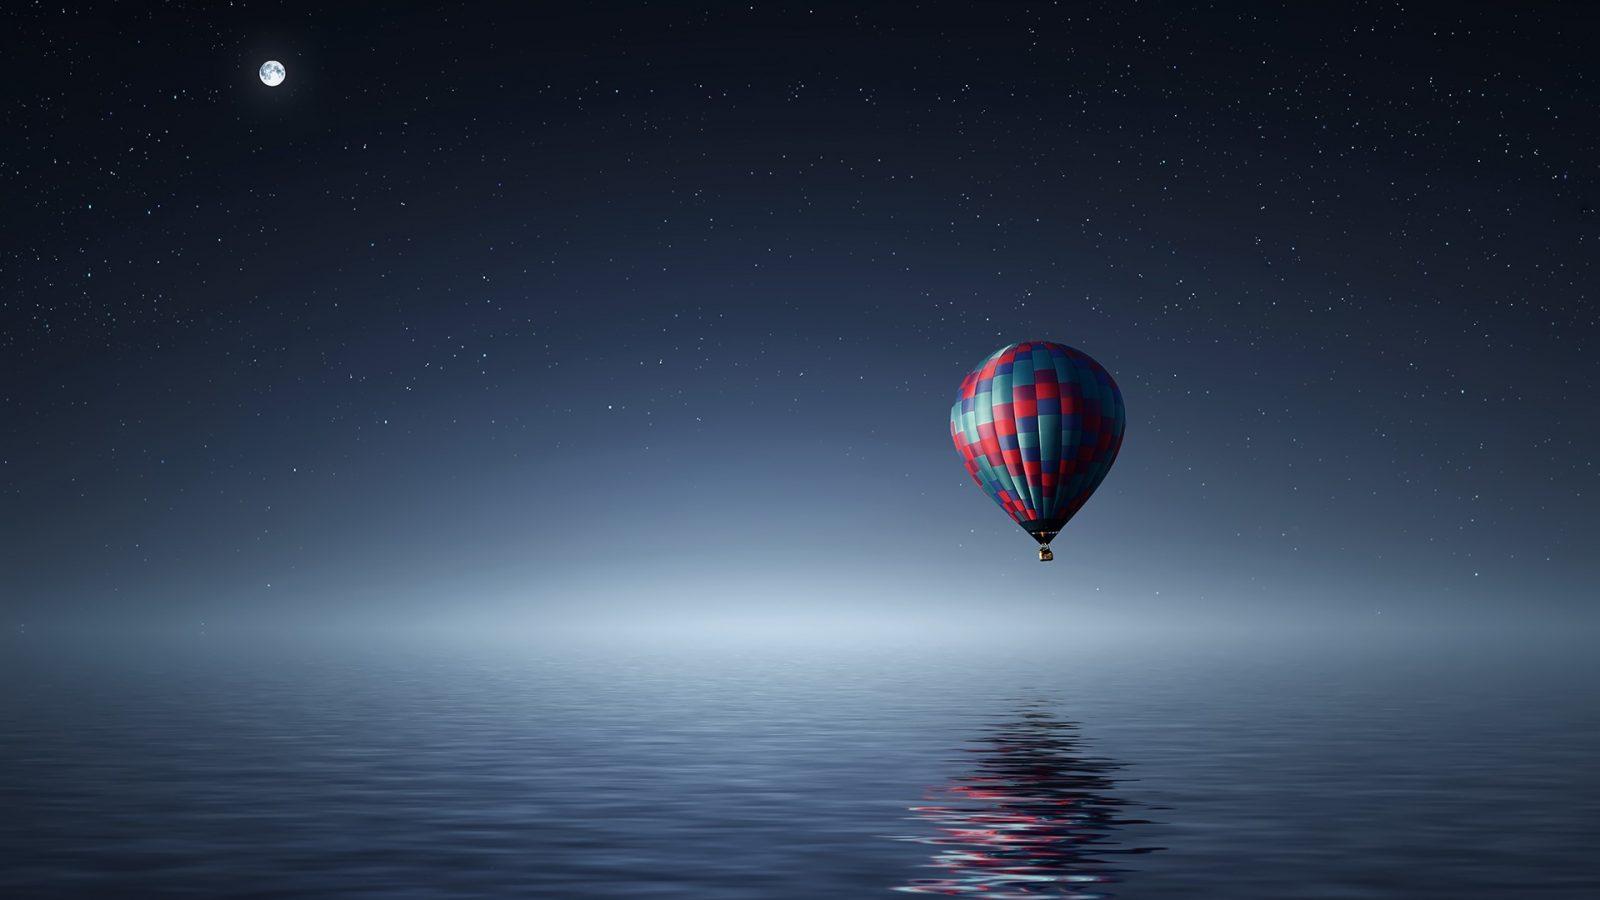 Free 3d Moving Wallpapers For Desktop Hot Air Balloon Over The Ocean Hd Wallpaper Hd Wallpaper